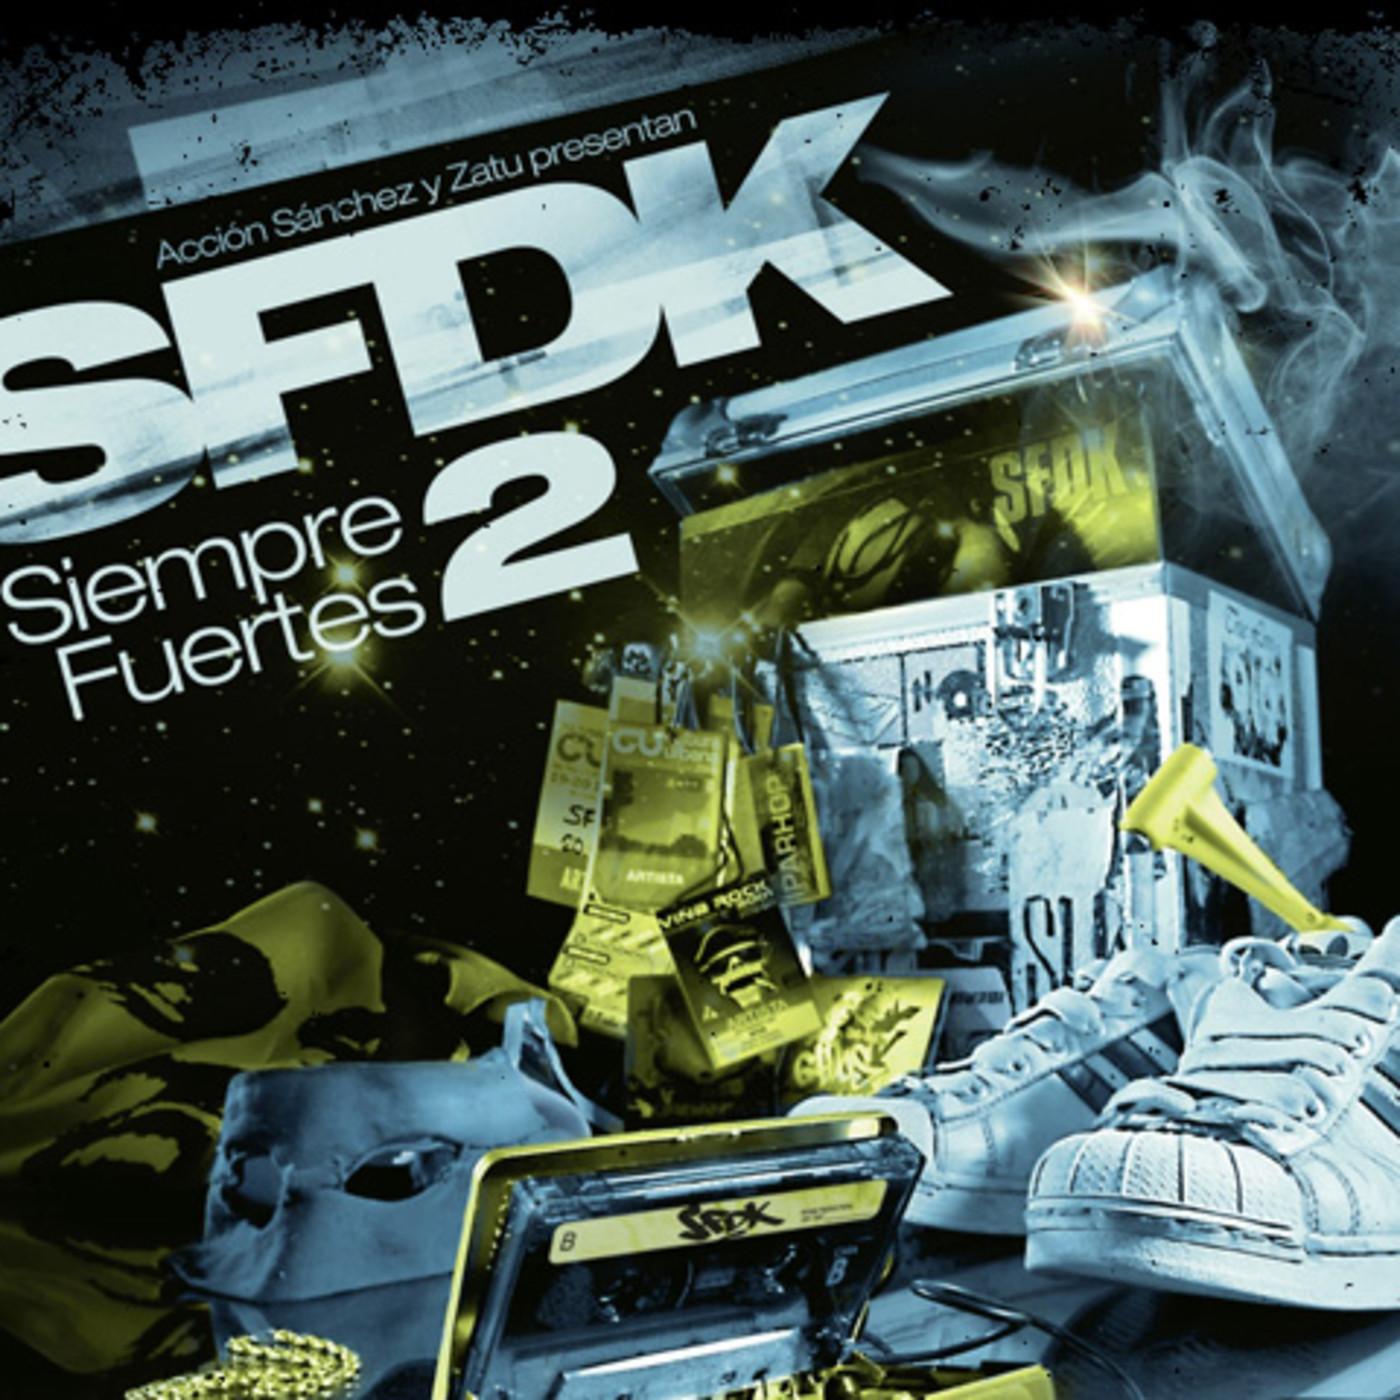 Entrevista Zatu SFDK (Siempre fuertes 2 LP)